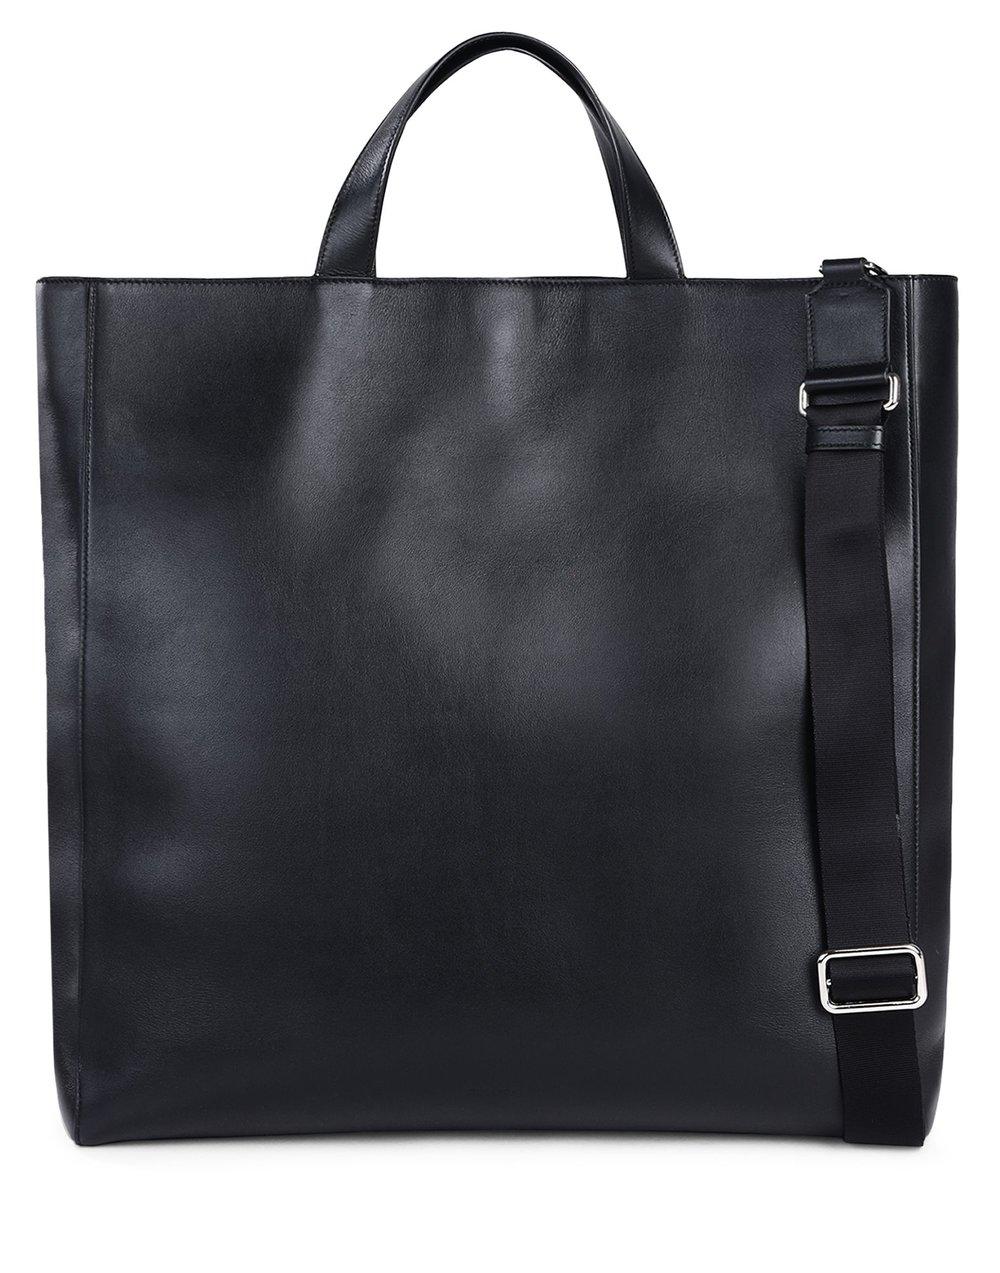 Jil Sander tote bag - £1,280 - An essential to get that NYC street style look